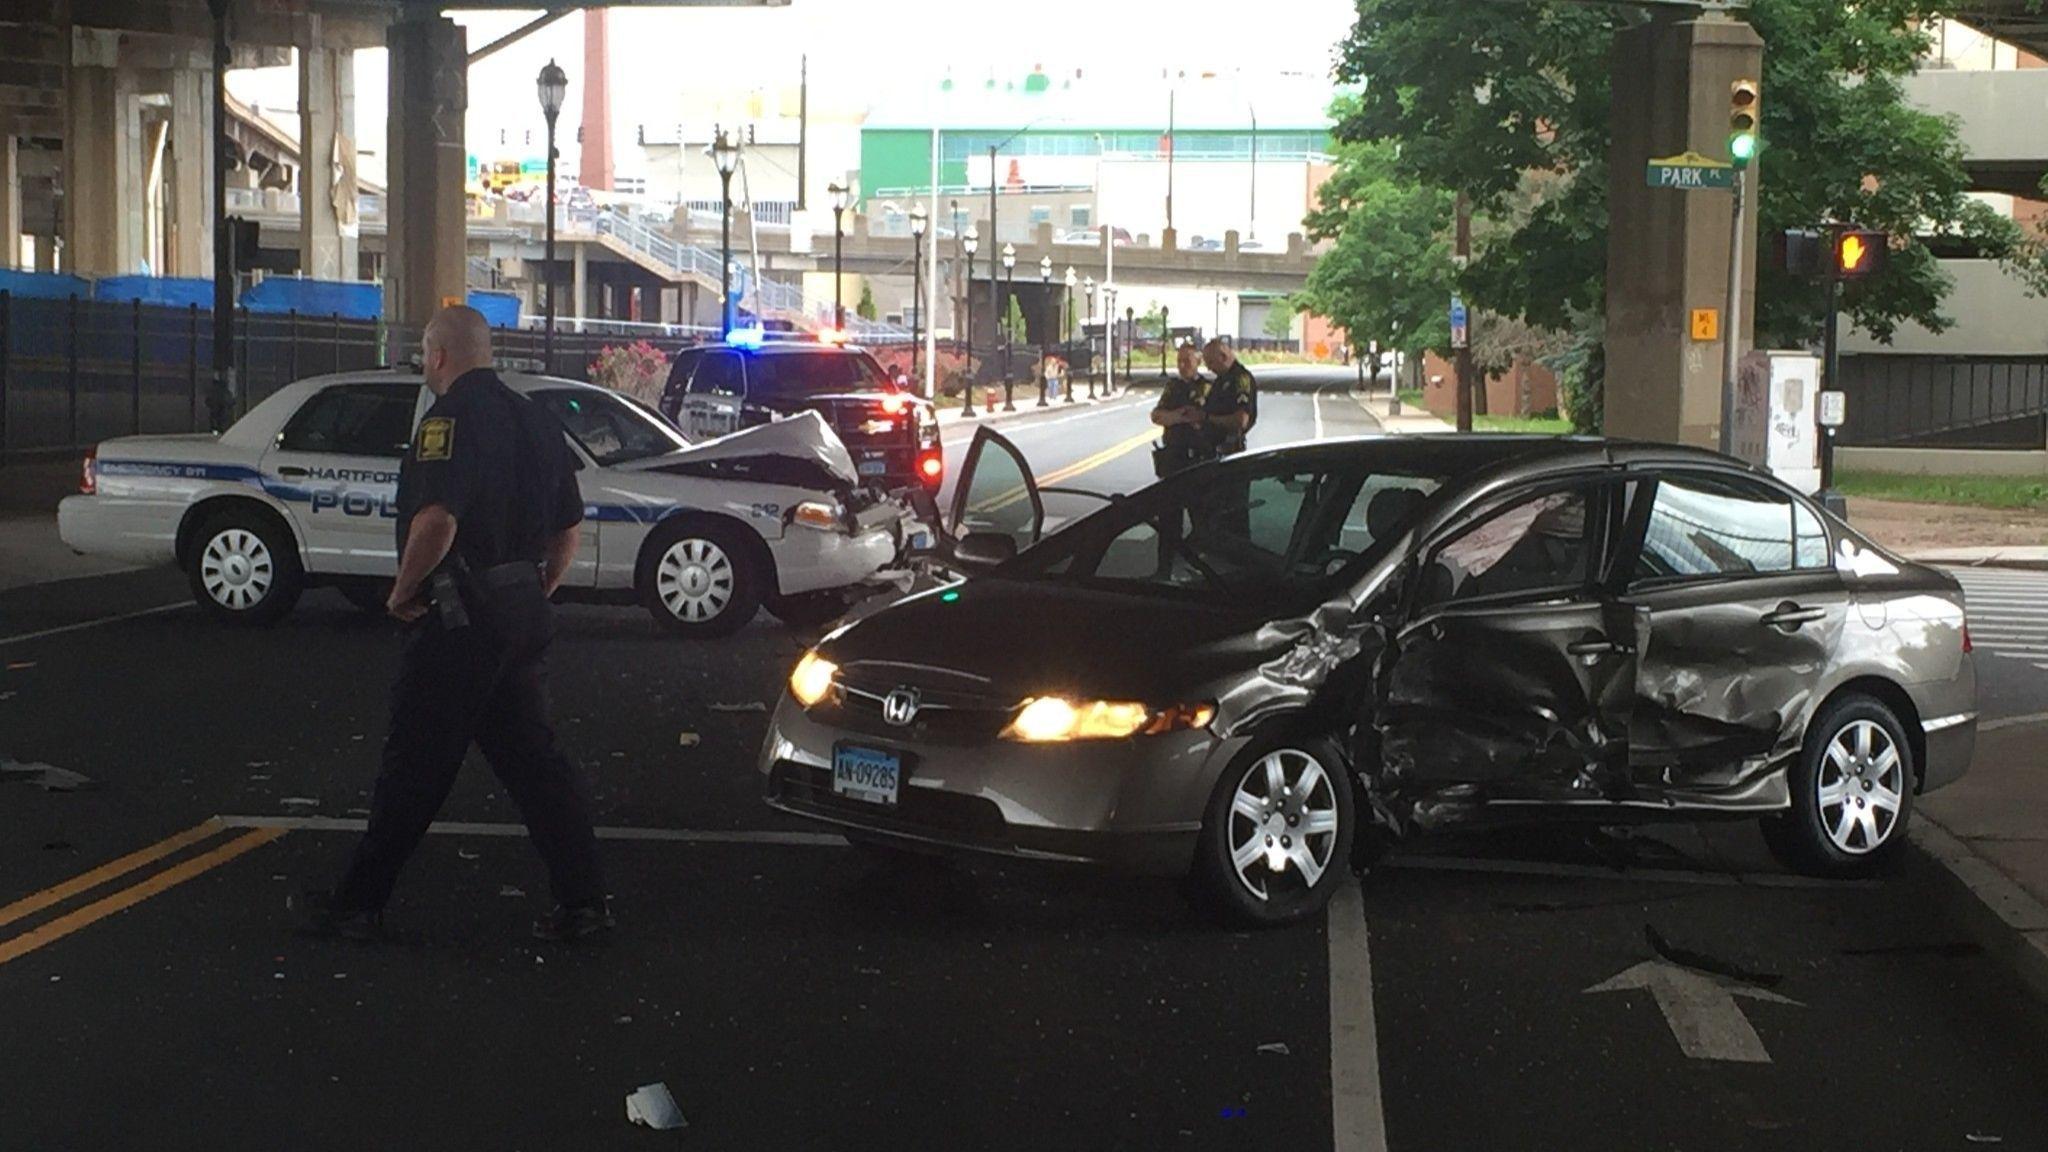 Crash Involving Hartford Police Car Closes Section Of Capitol Avenue Through Rush Hour | Hartford Courant